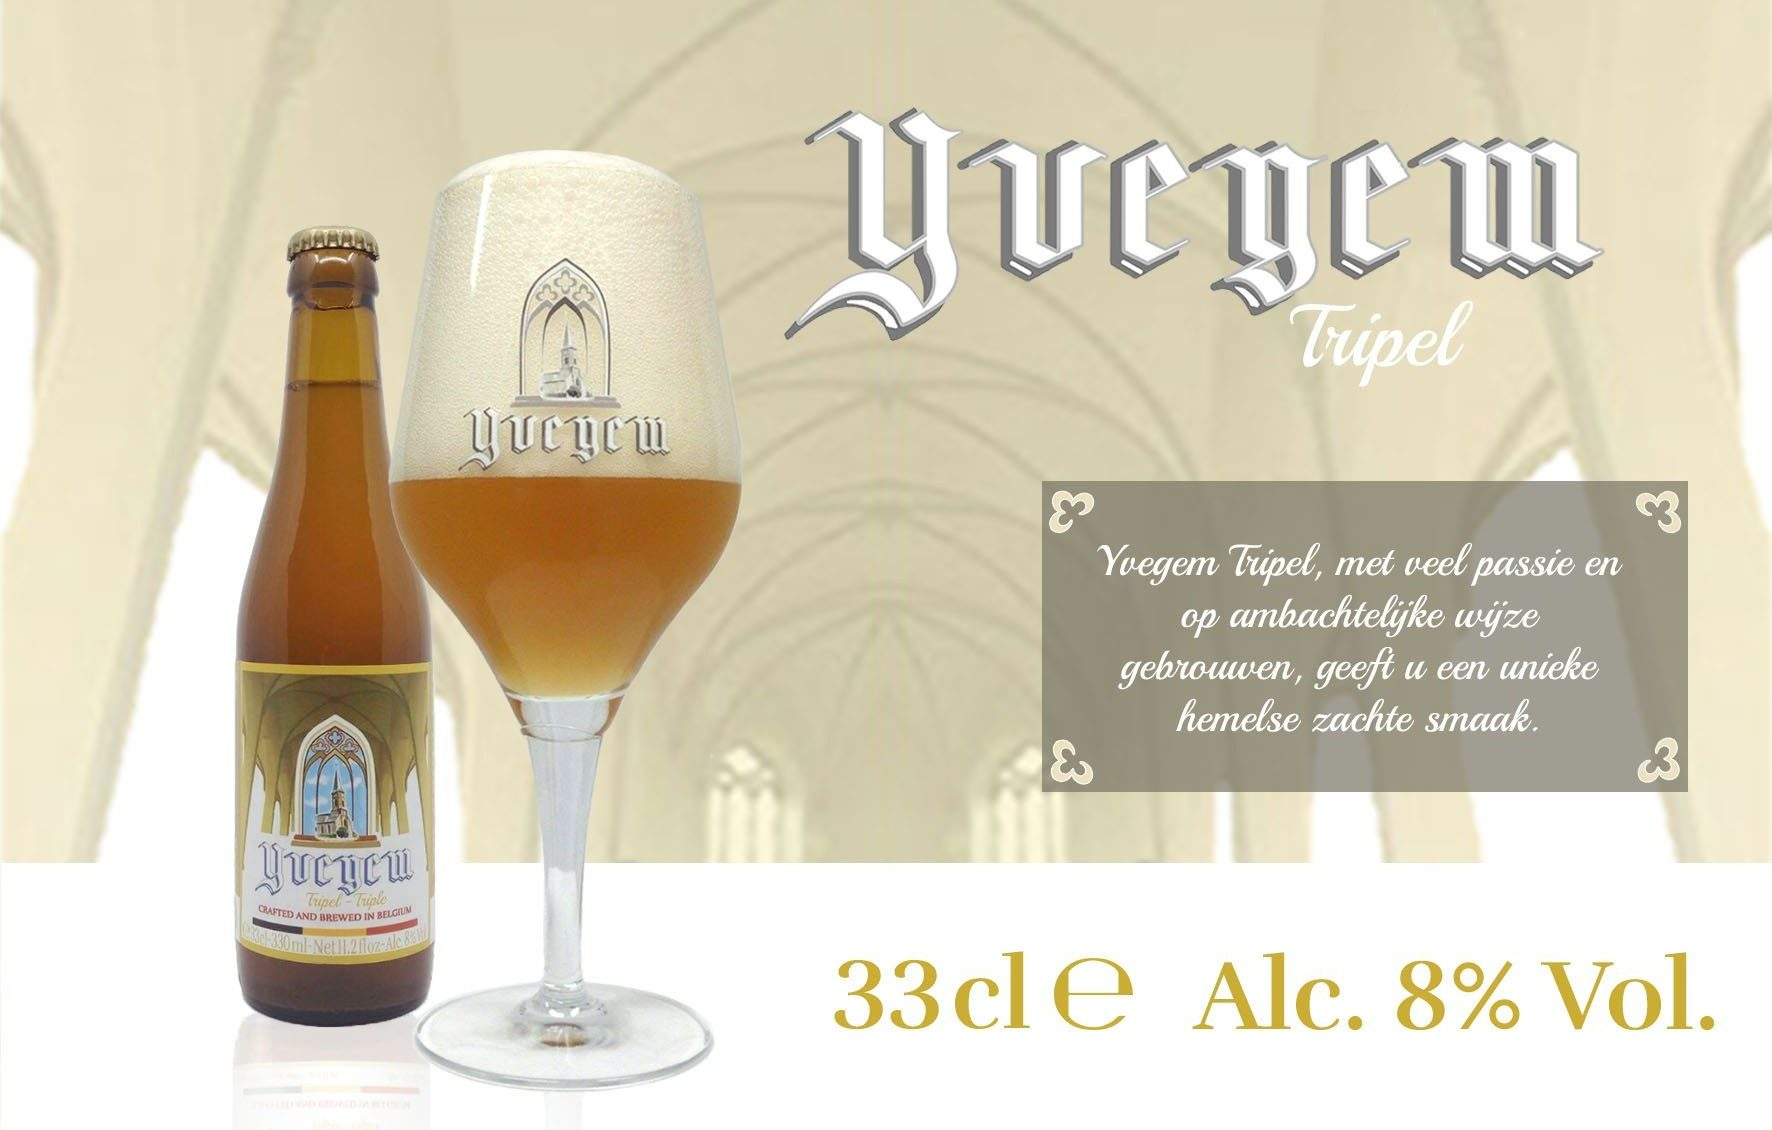 belgabrew yvegem tripel Belgian craft beer